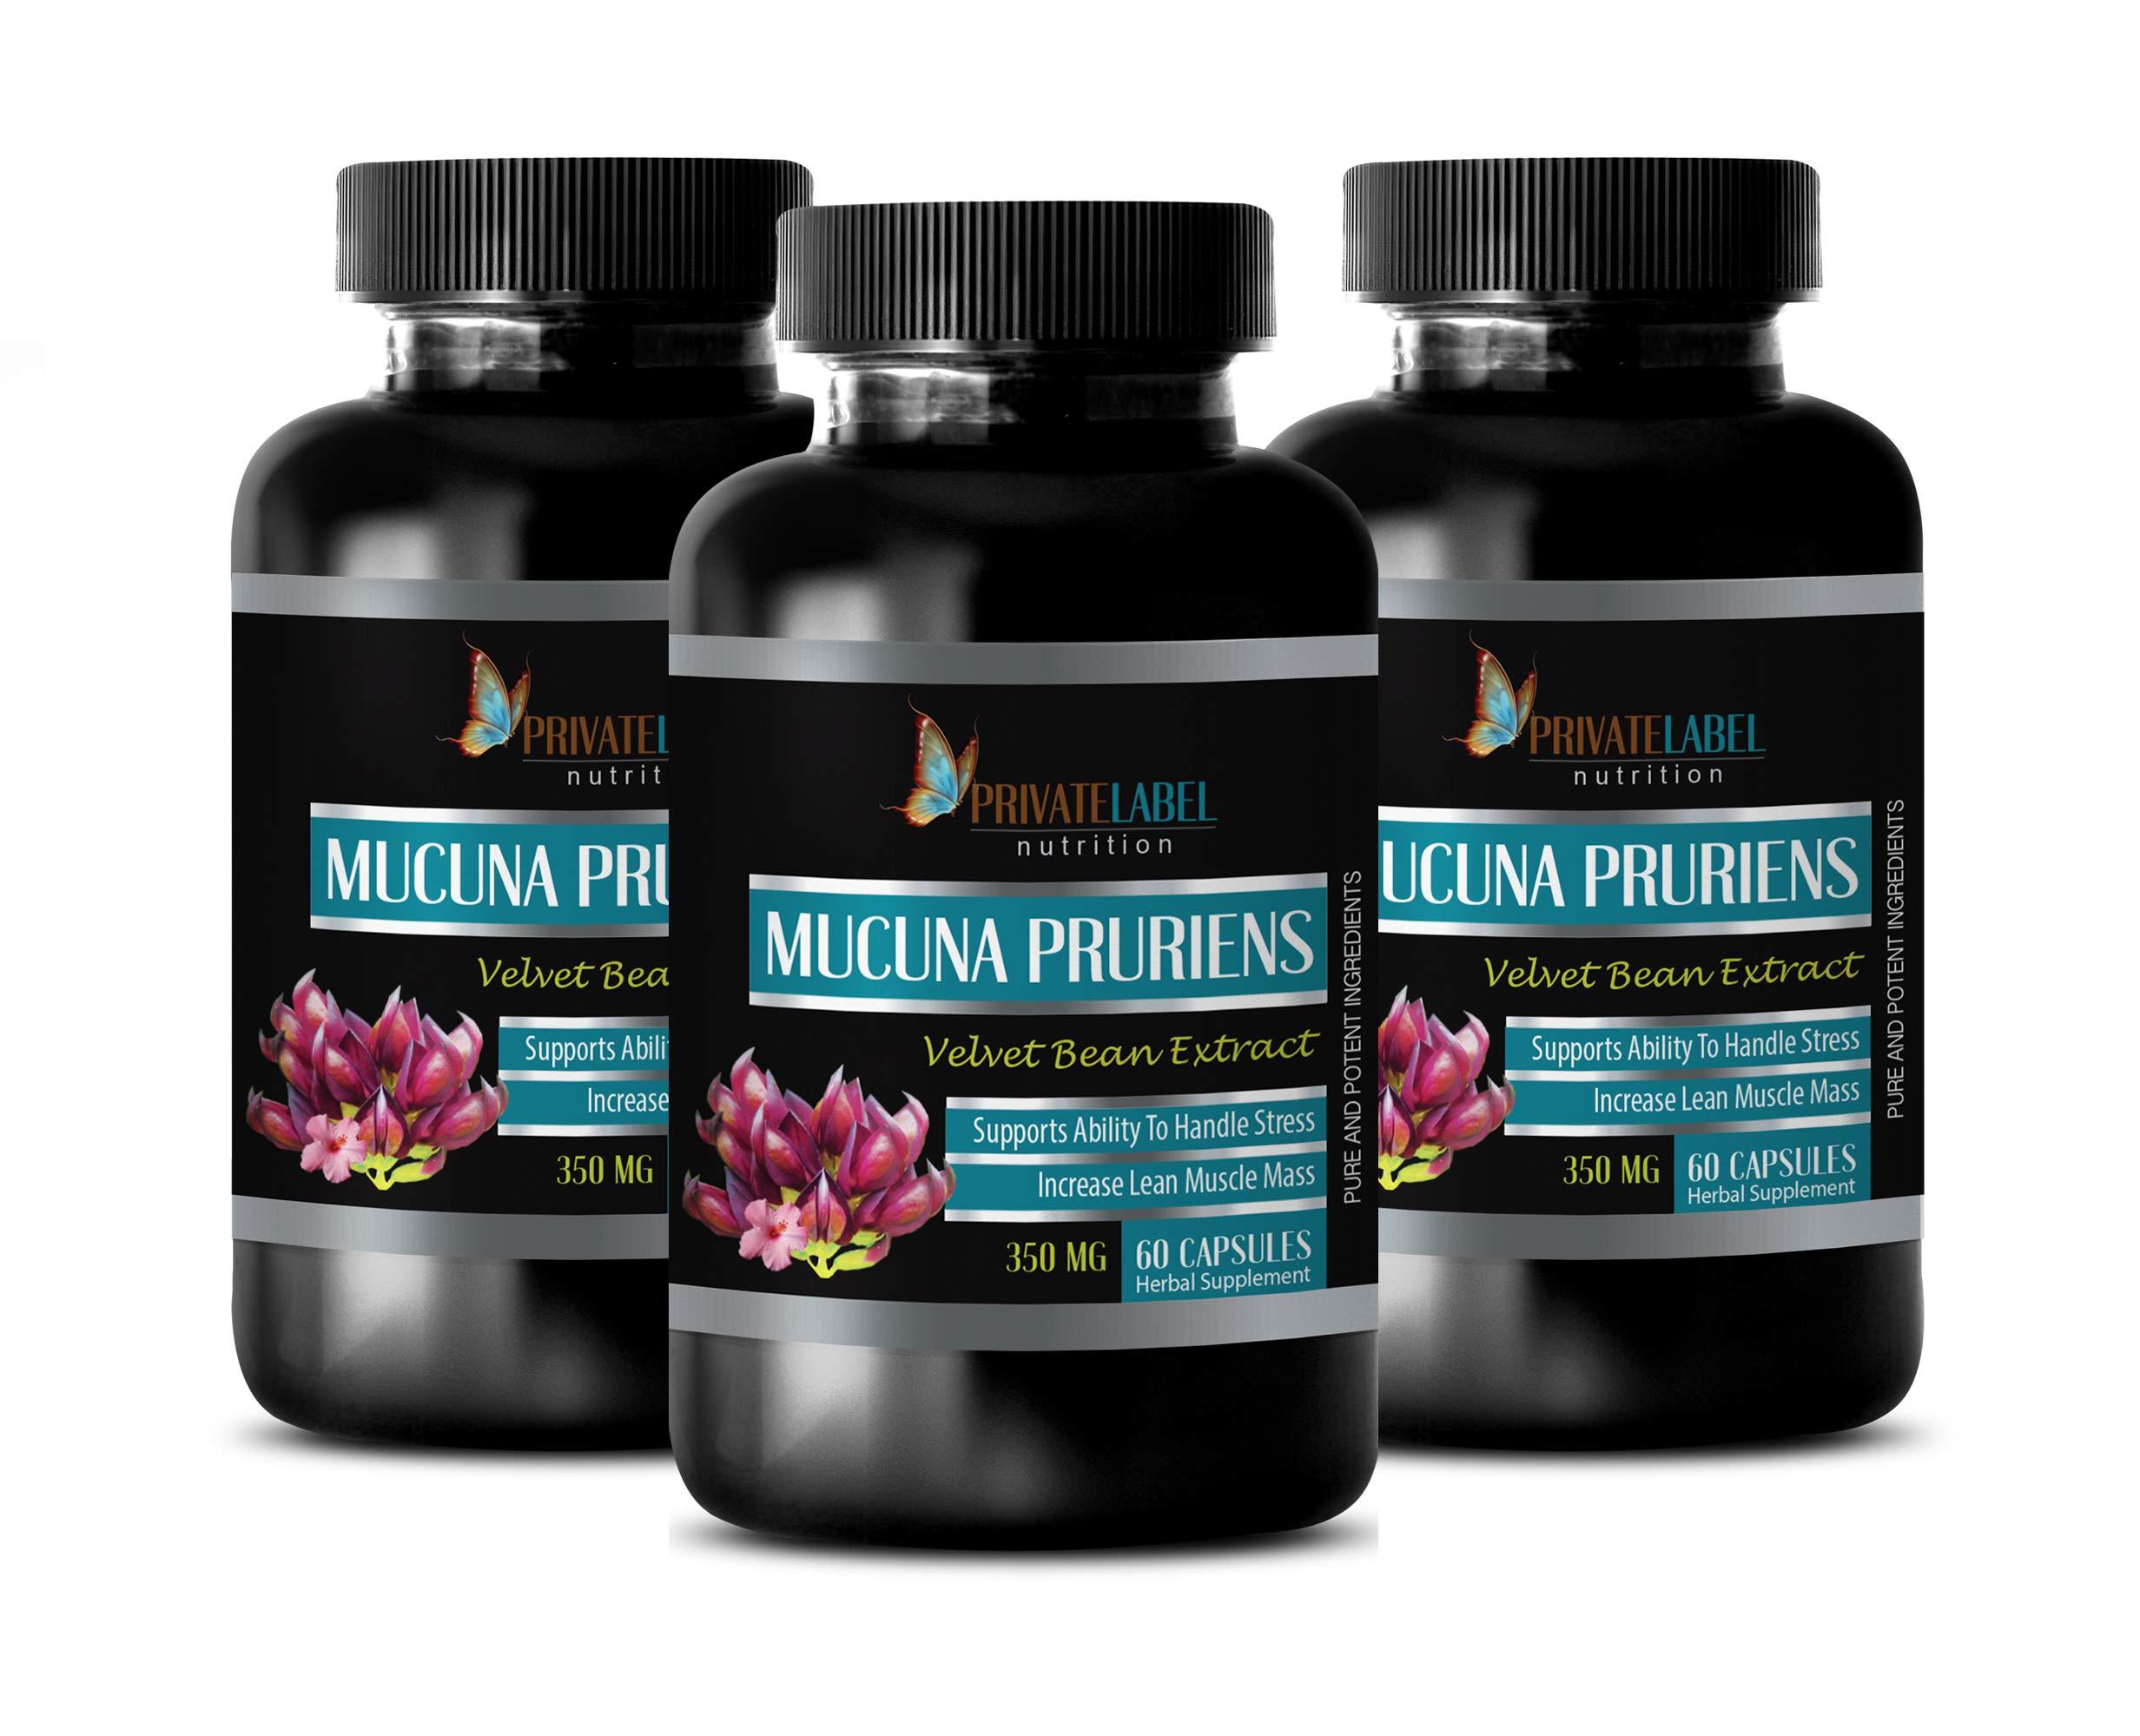 Mood Swings Supplements - MUCUNA PRURIENS 350 MG - Velvet Beans Extract - antioxidant Vitamins for Men - 3 Bottles 180 Capsules